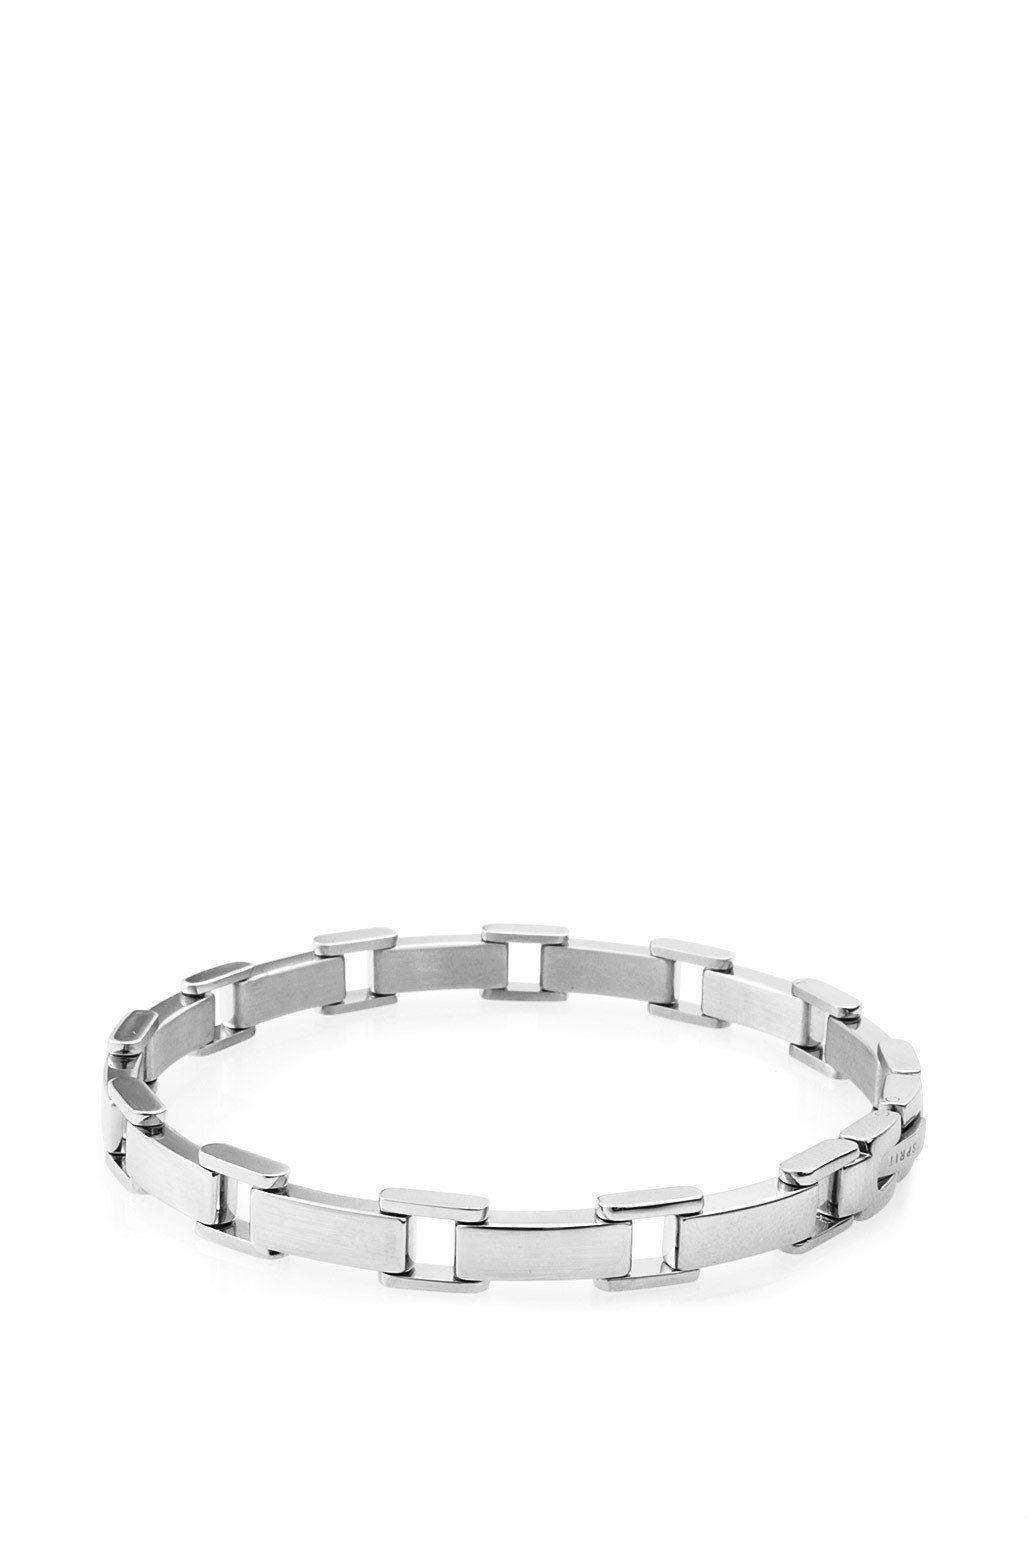 ESPRIT CASUAL Silberfarbenes Gliederarmband